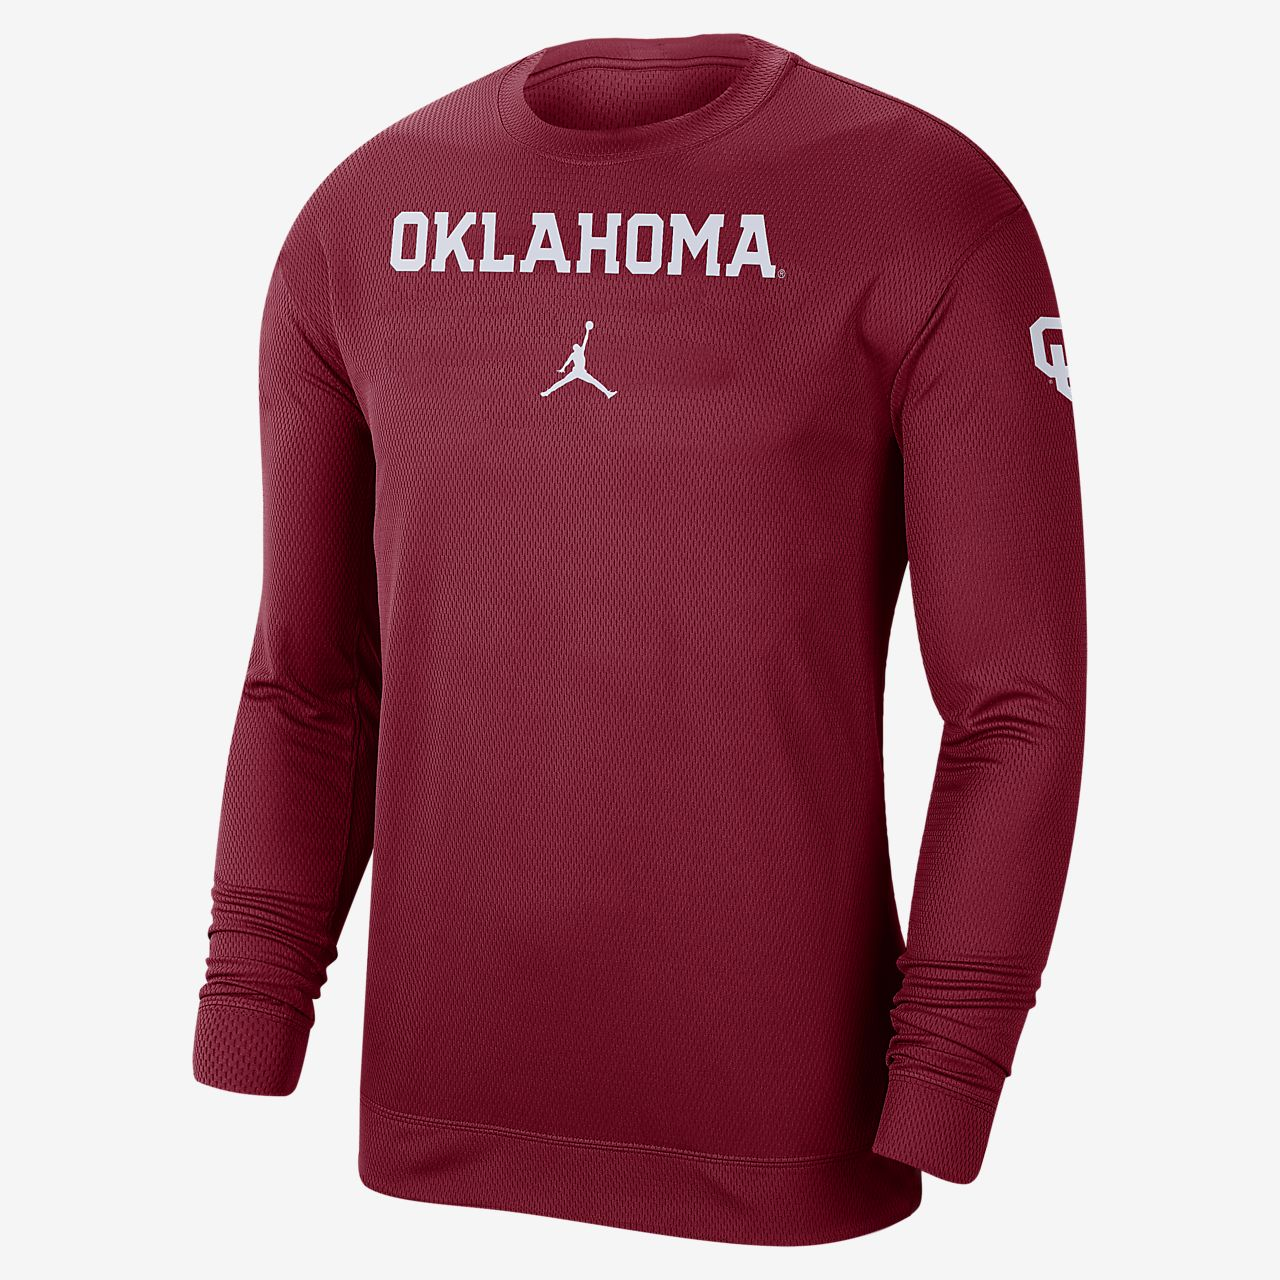 Jordan College Dri-FIT Spotlight (Oklahoma) Men's Long-Sleeve Top